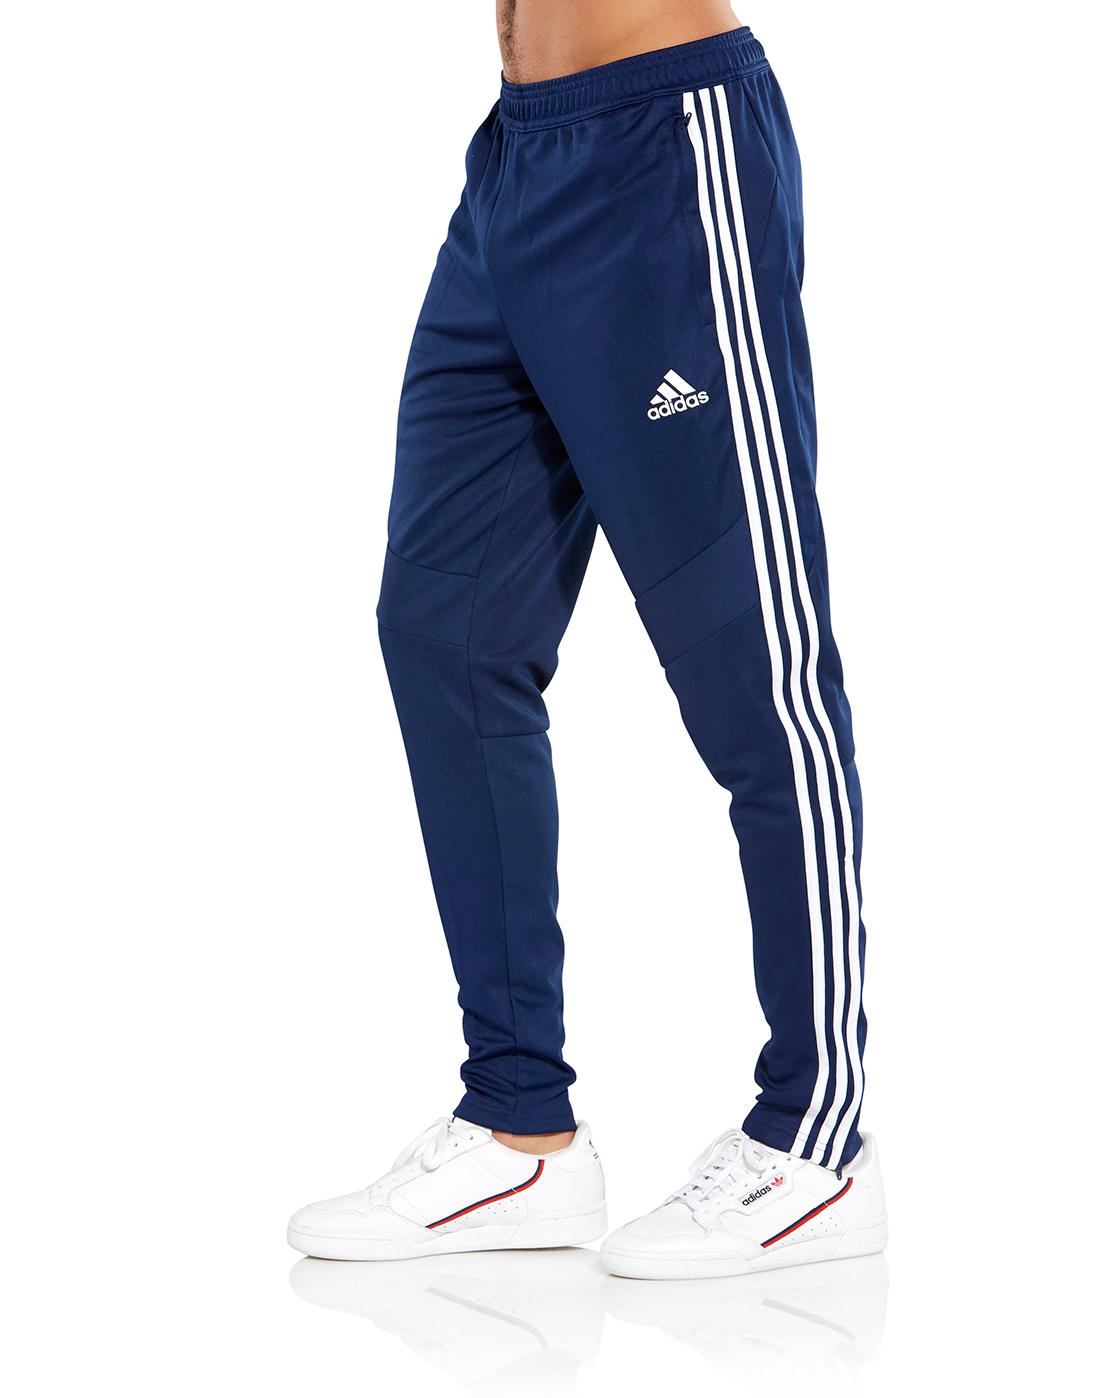 d88ccae5e99a2 Mens Tiro 19 Pants